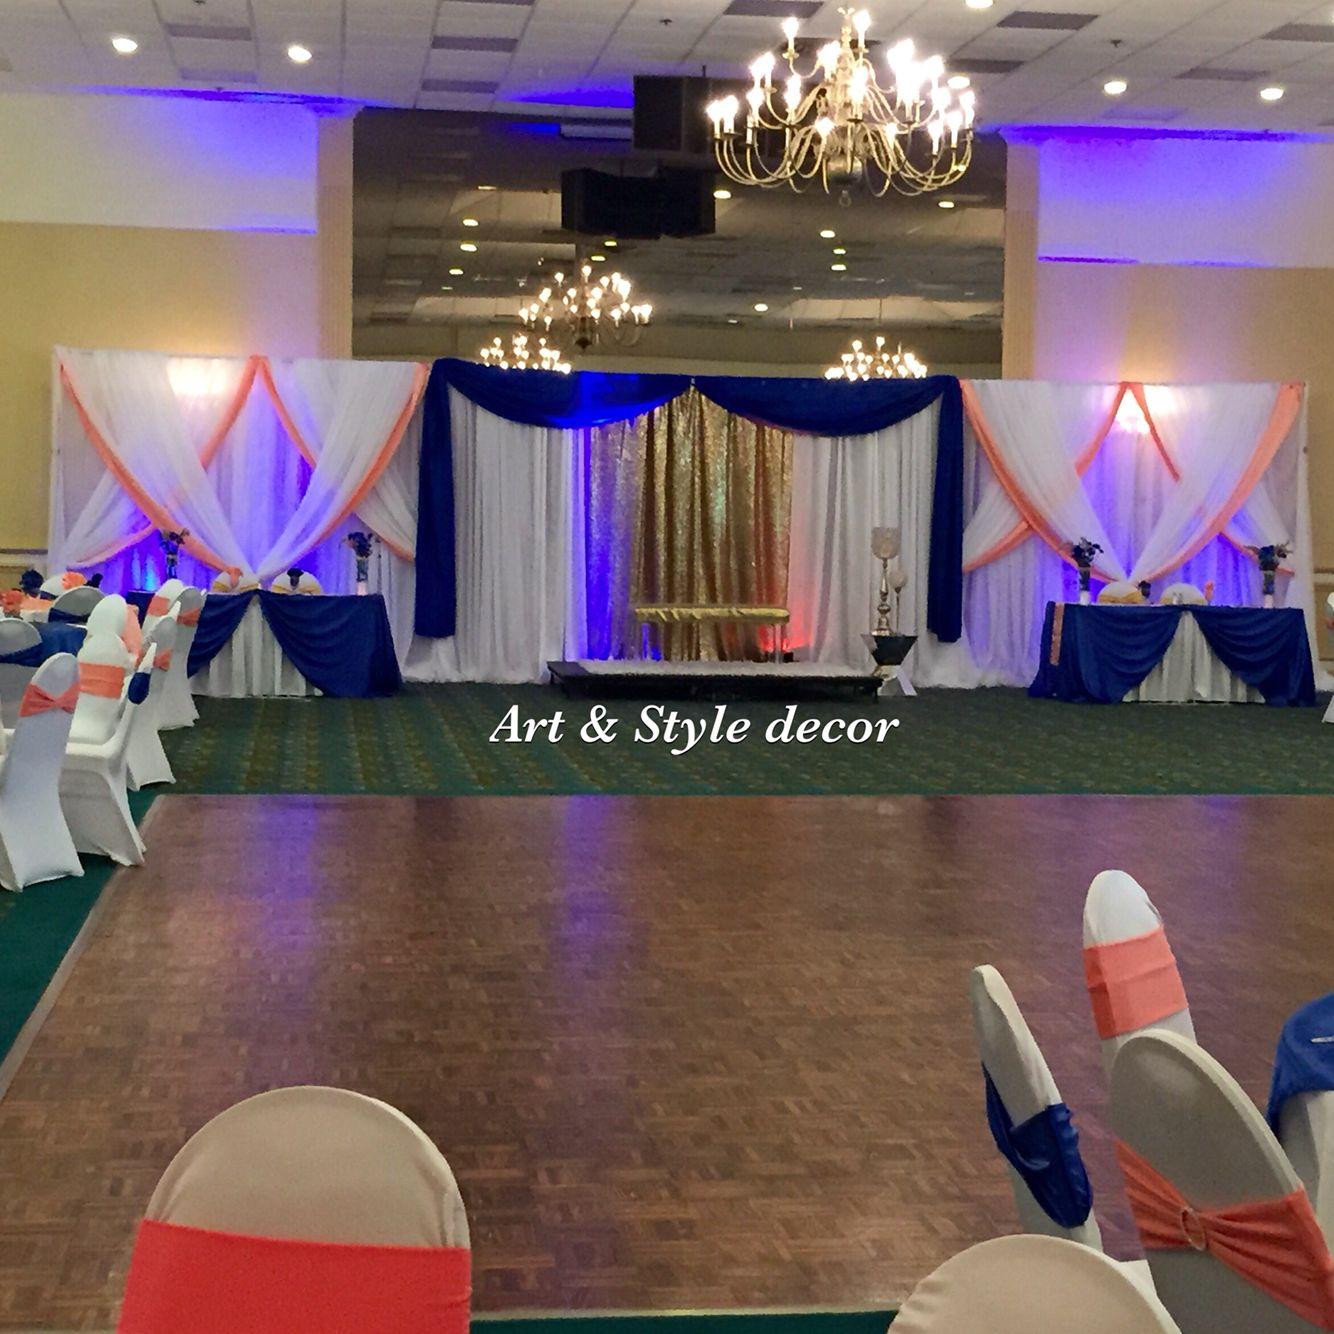 Royal Blue And Coral Wedding Decor Artandstyledecor Blue